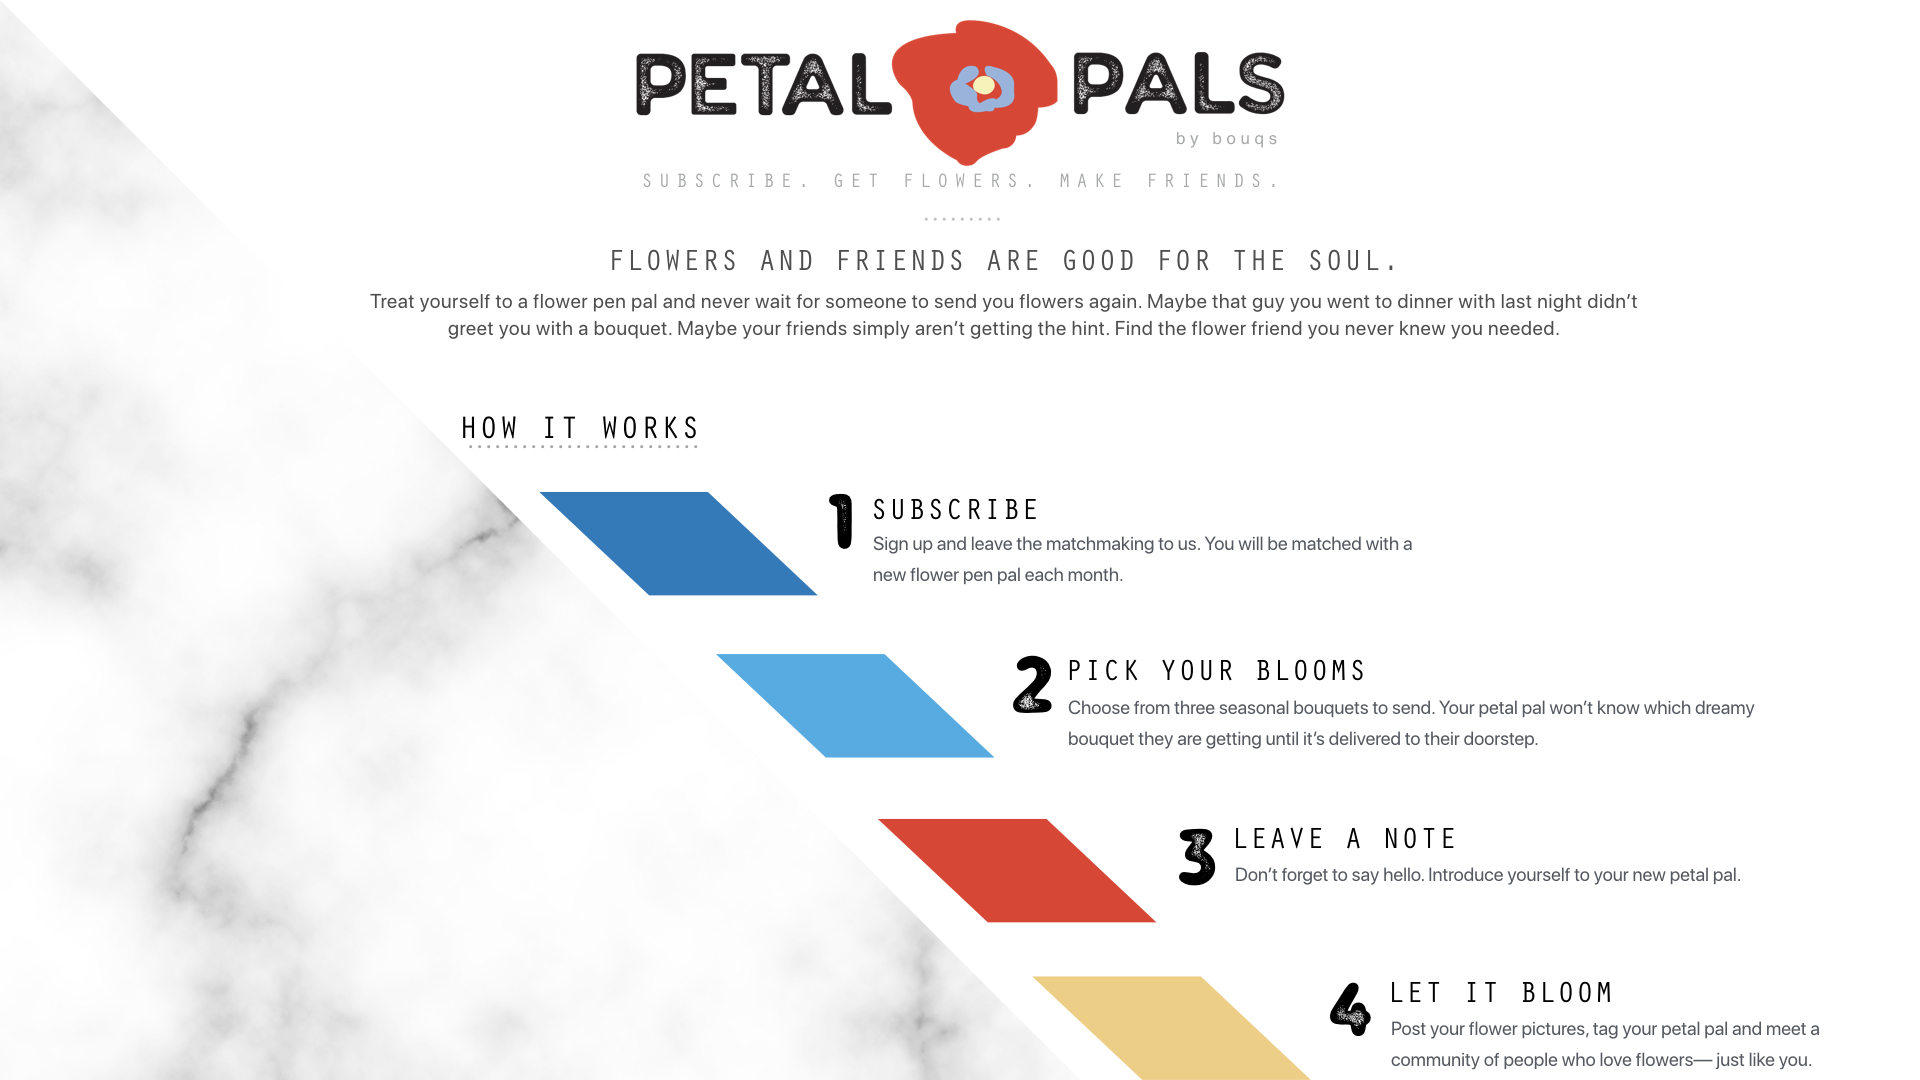 petal+pals.001.jpg